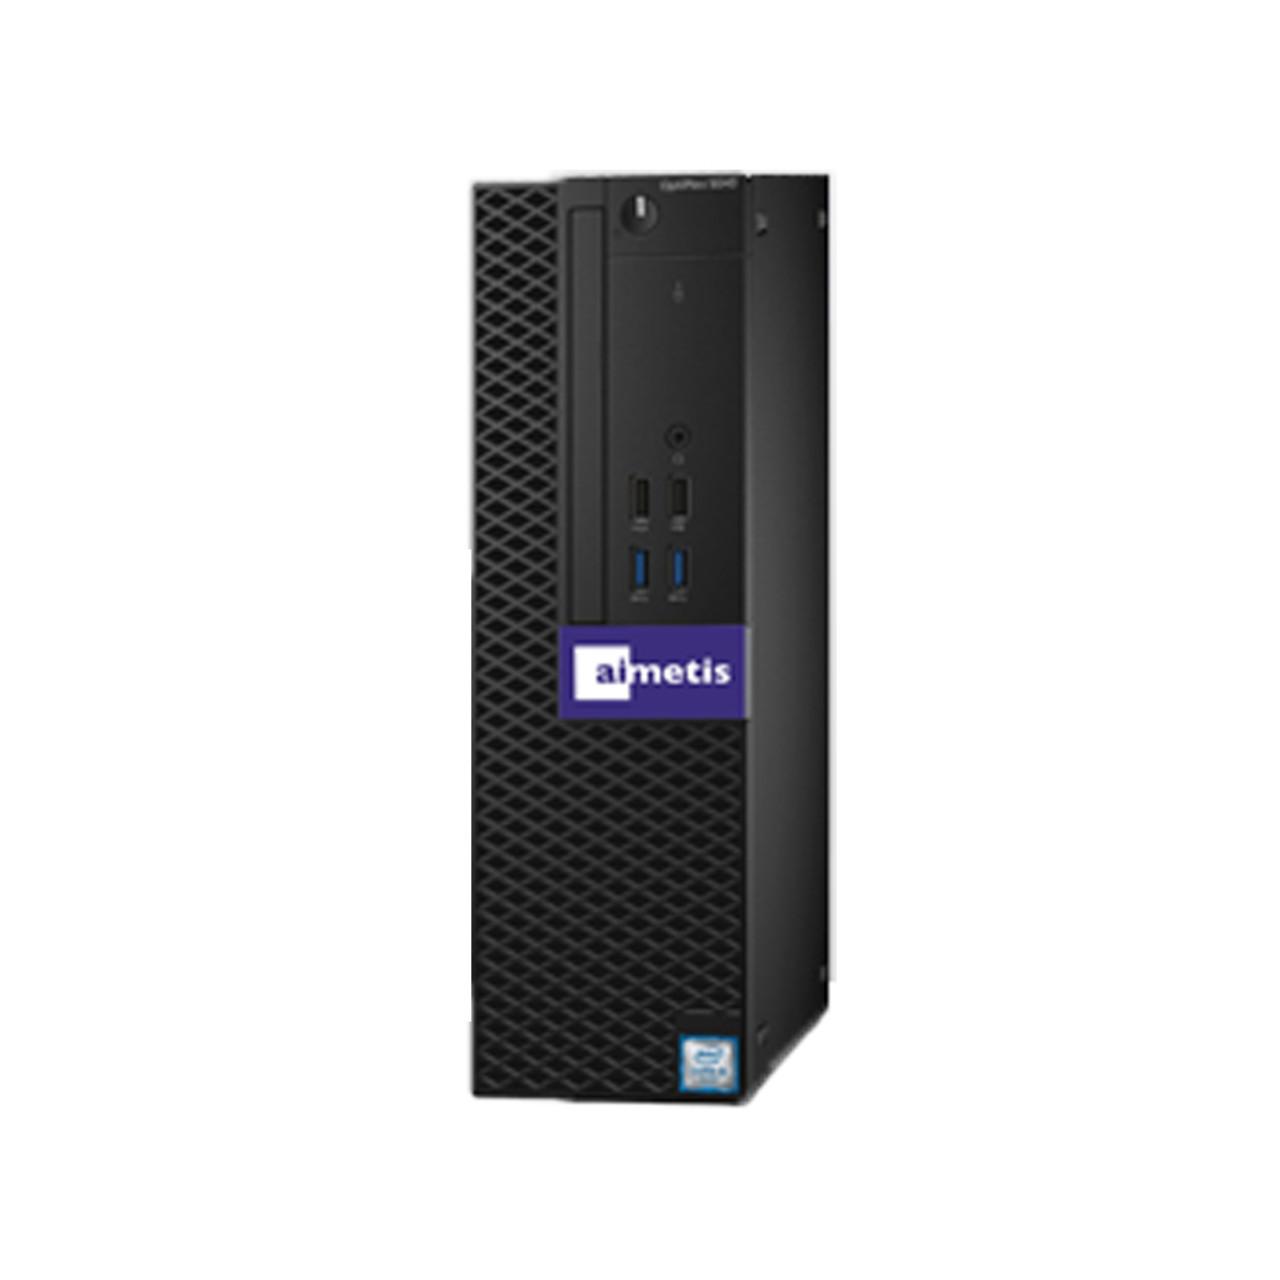 r001 understanding computer systems